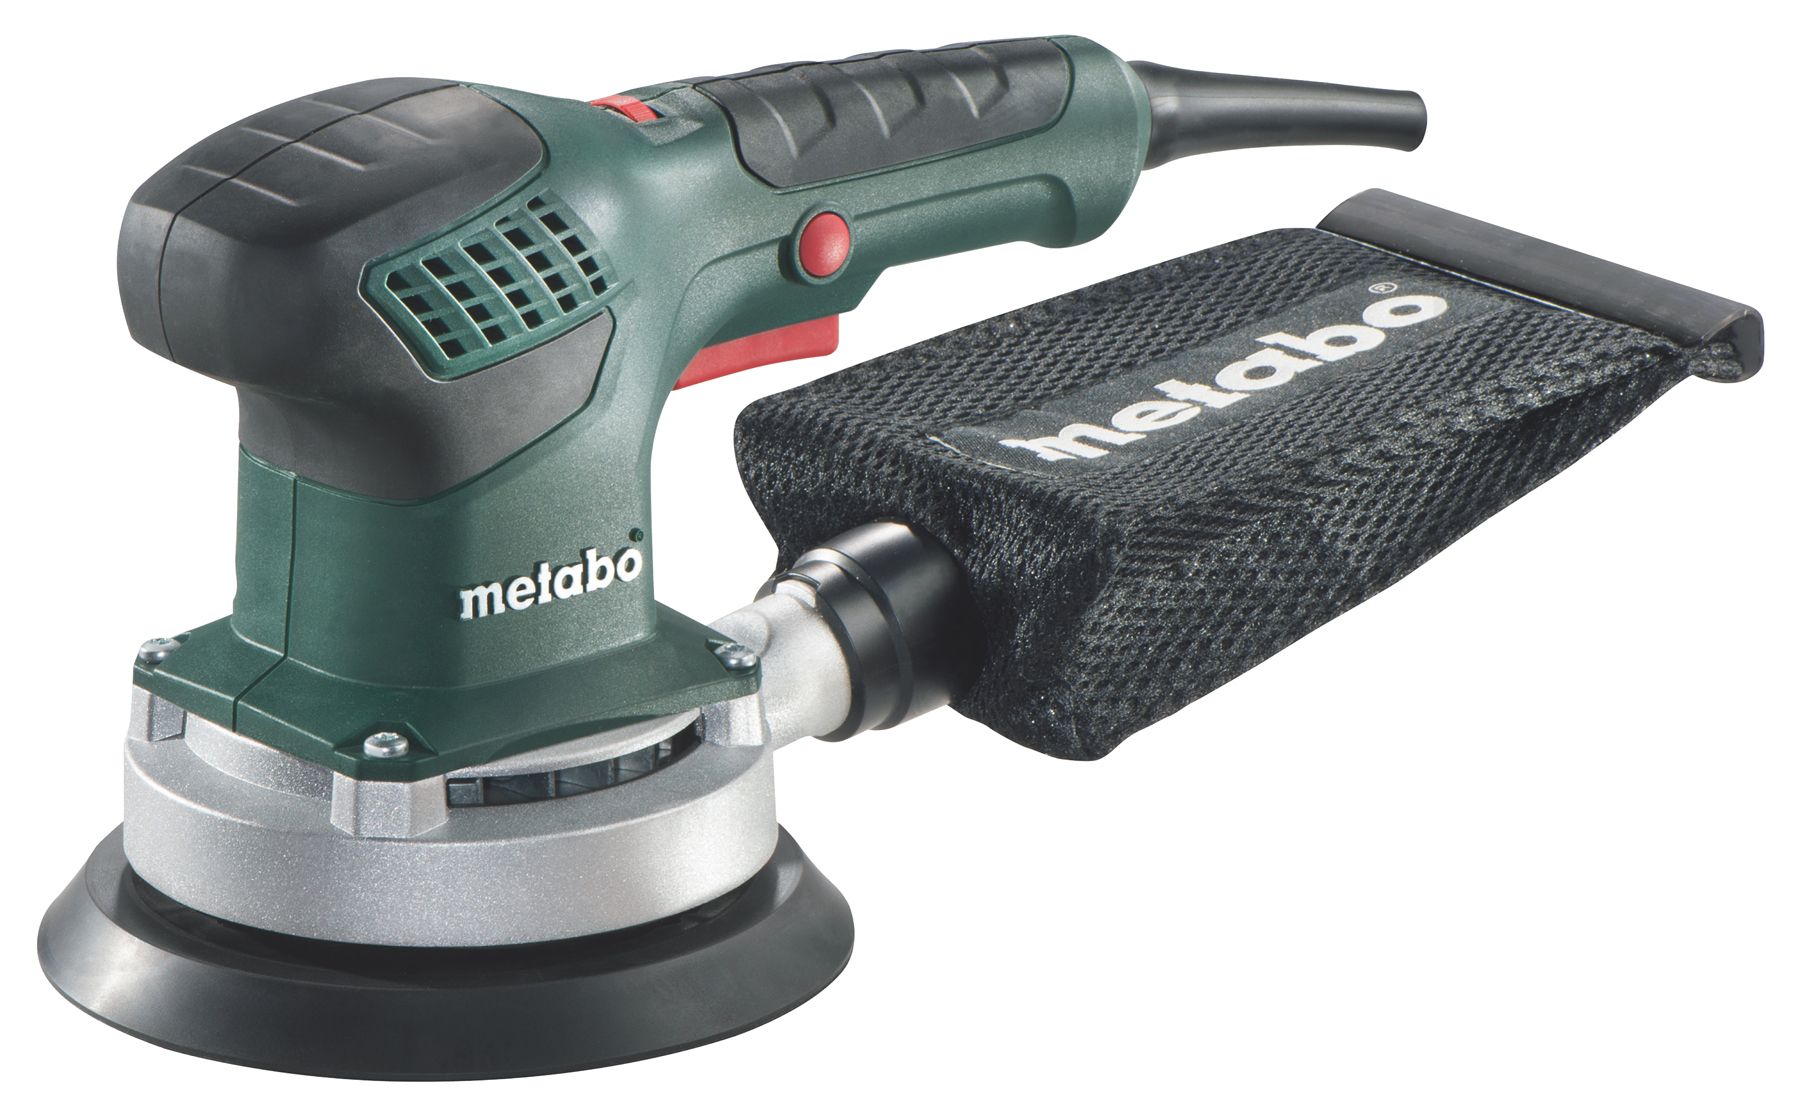 Metabo SXE 3150 (600444500) - эксцентриковая шлифмашина + кейс (Green) от iCover